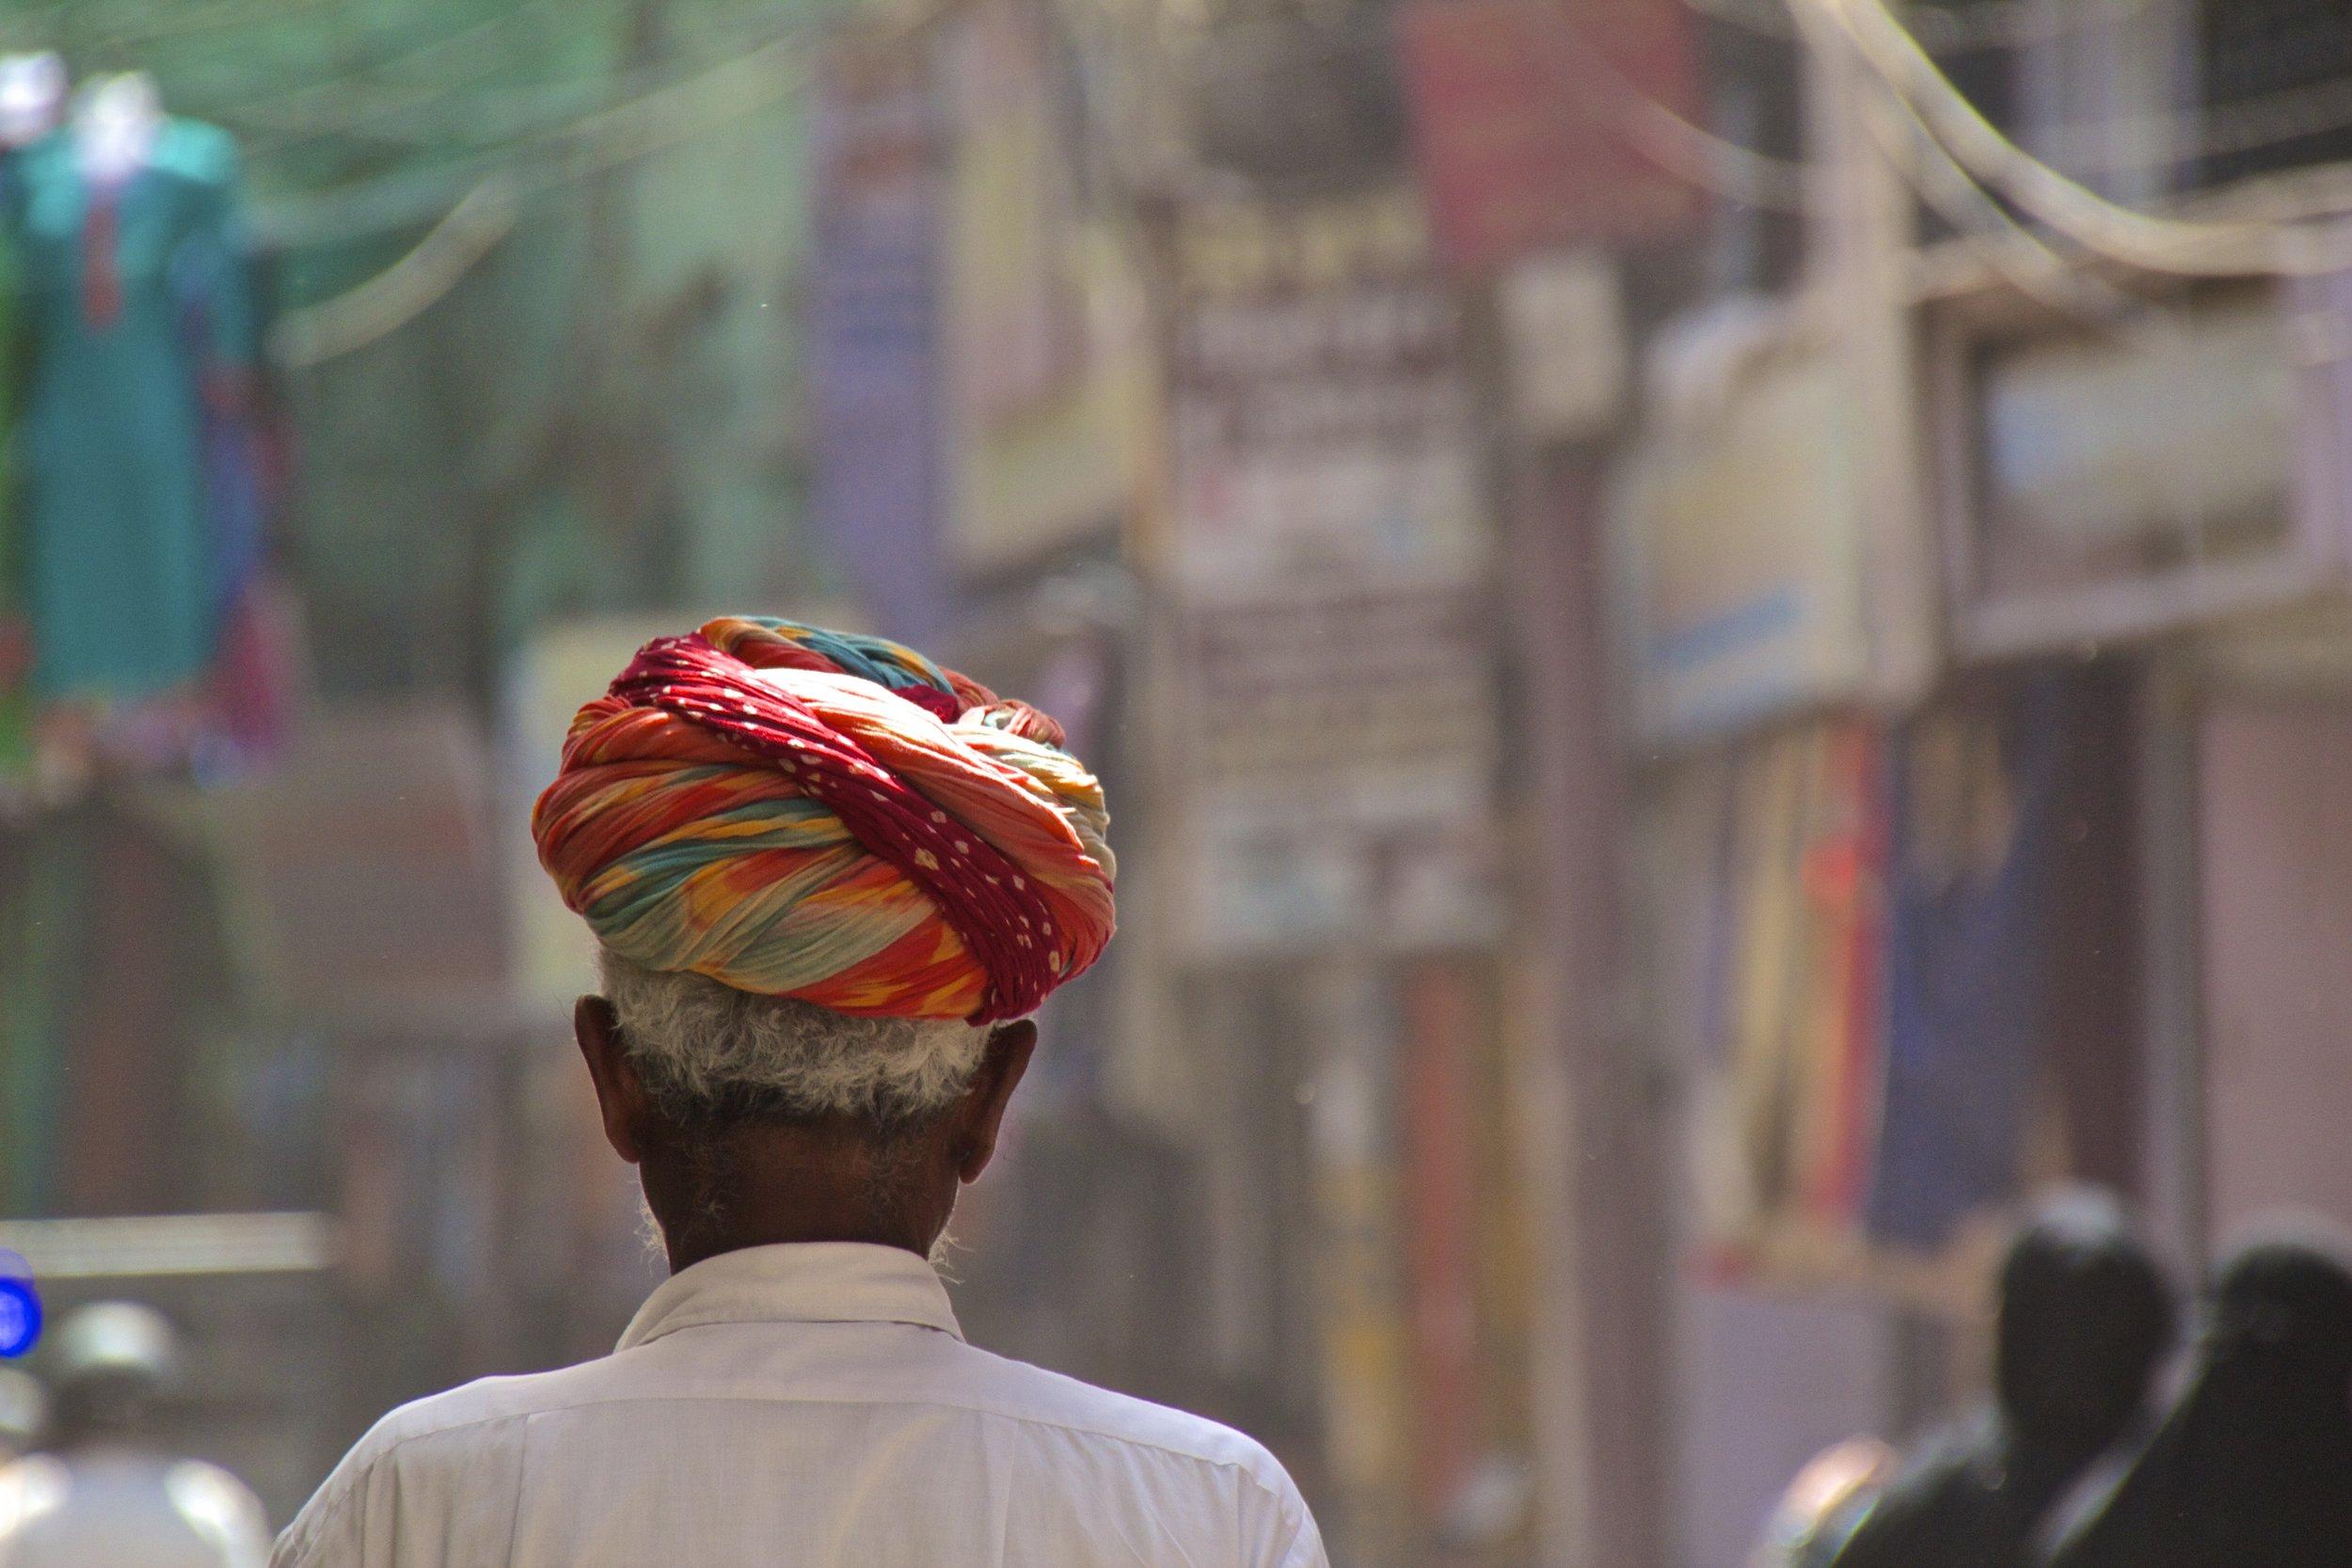 jodhpur rajasthan india city street photography 9.jpg